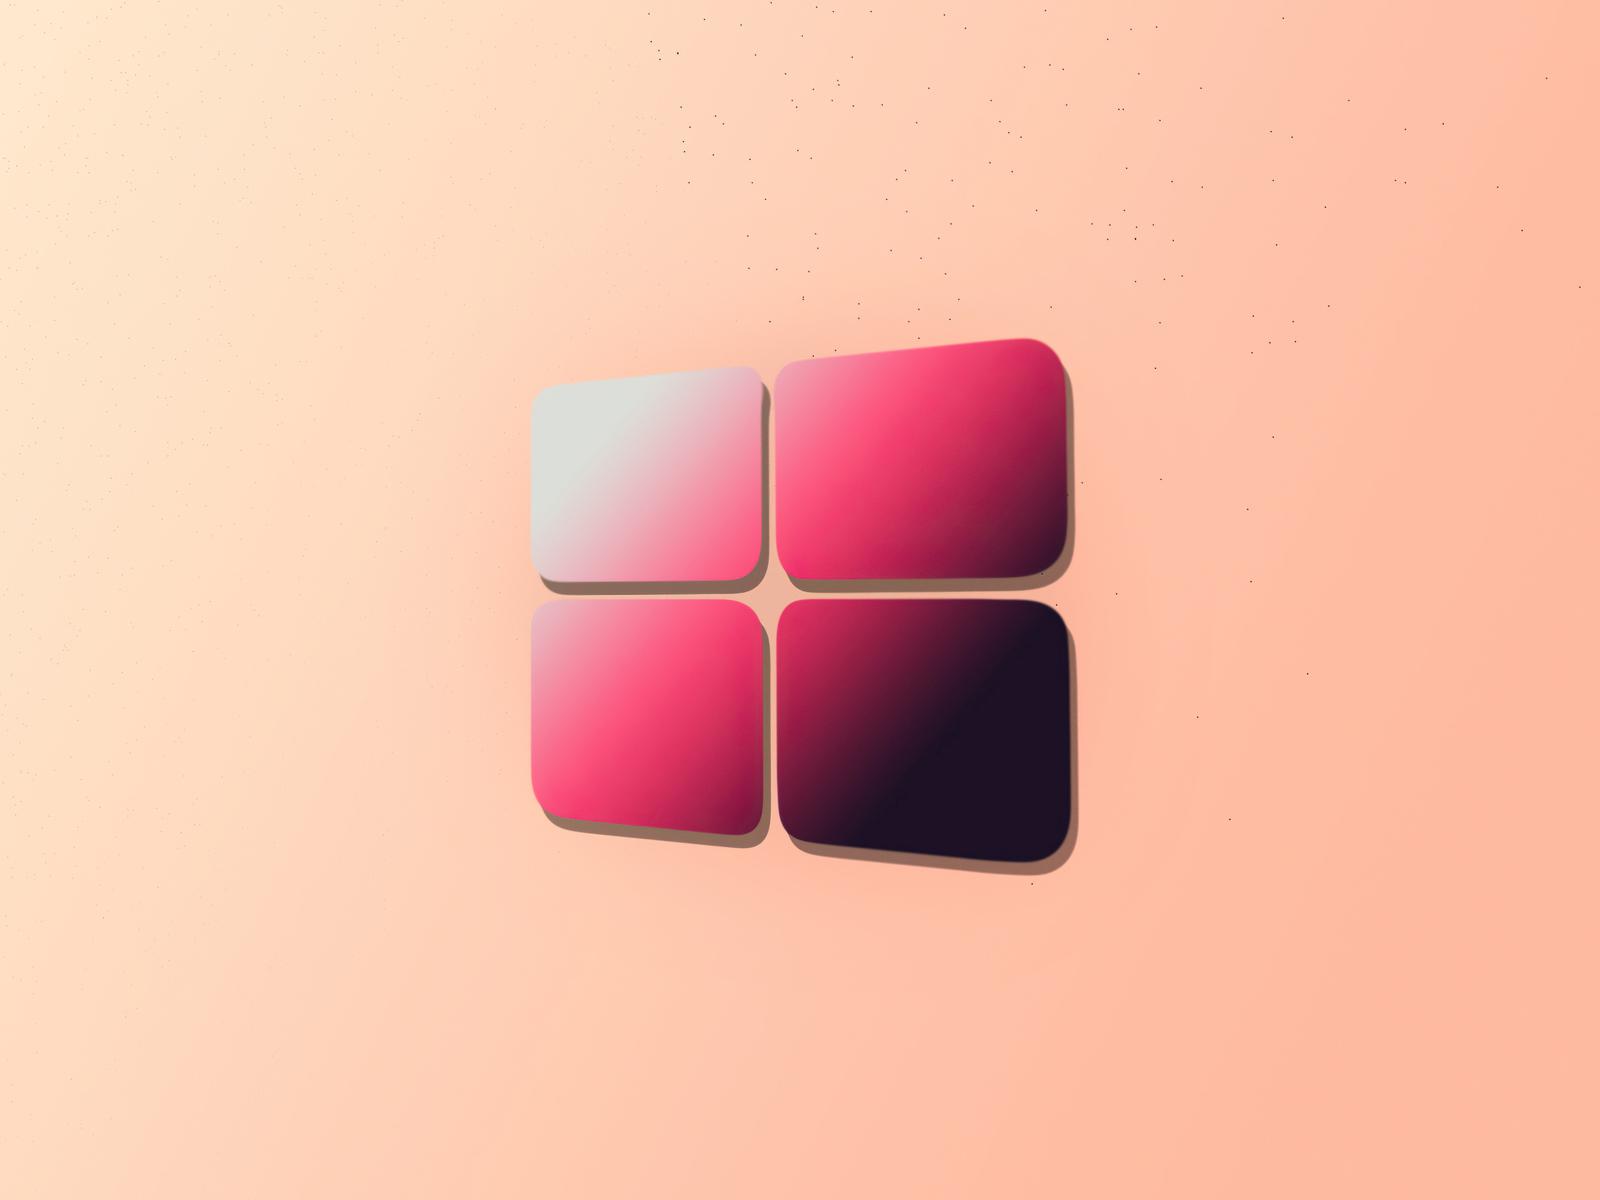 windows-10-gradient-logo-4k-4g.jpg